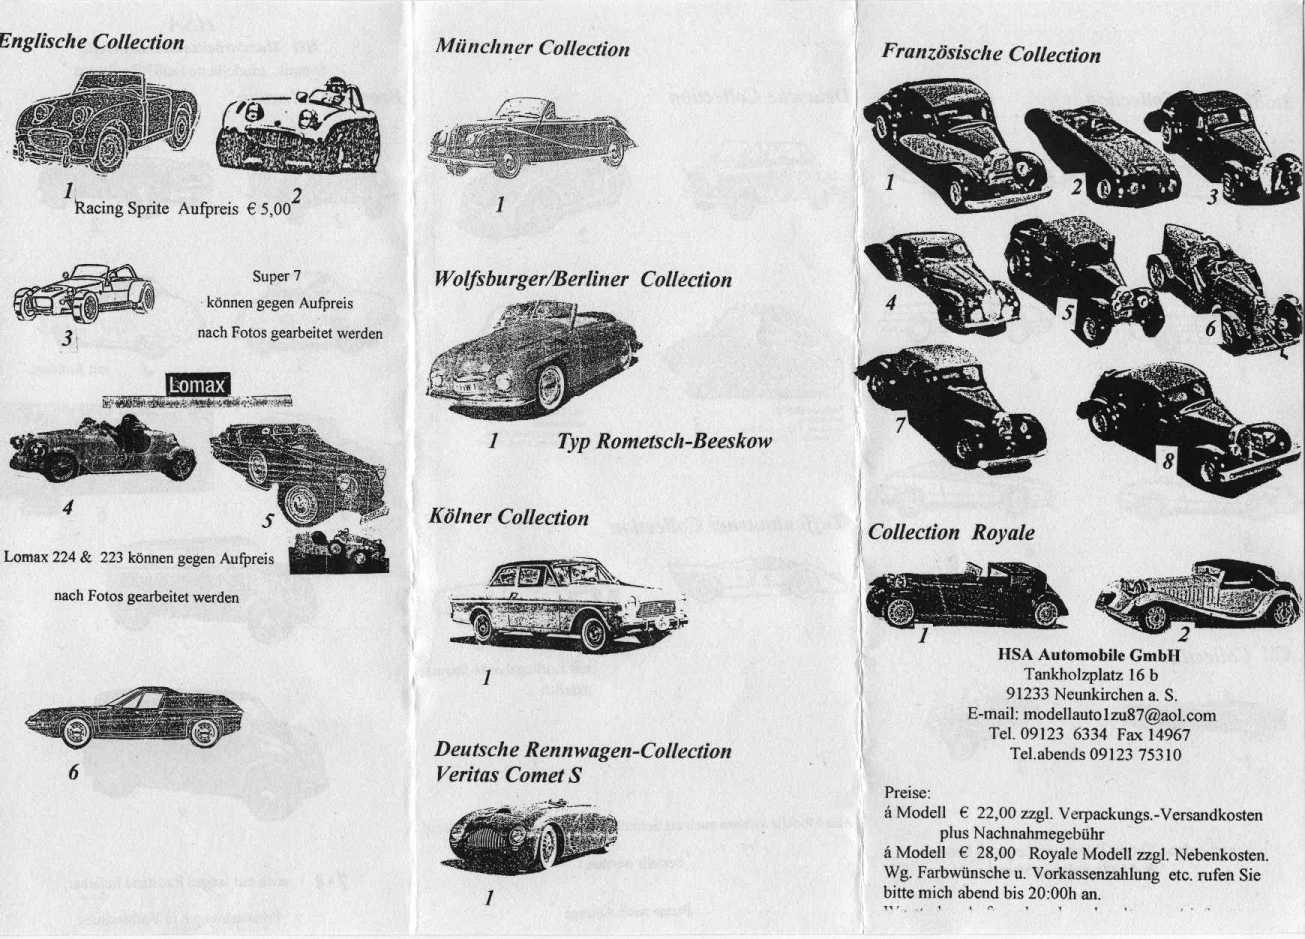 Spyker Cars Heritage Photos